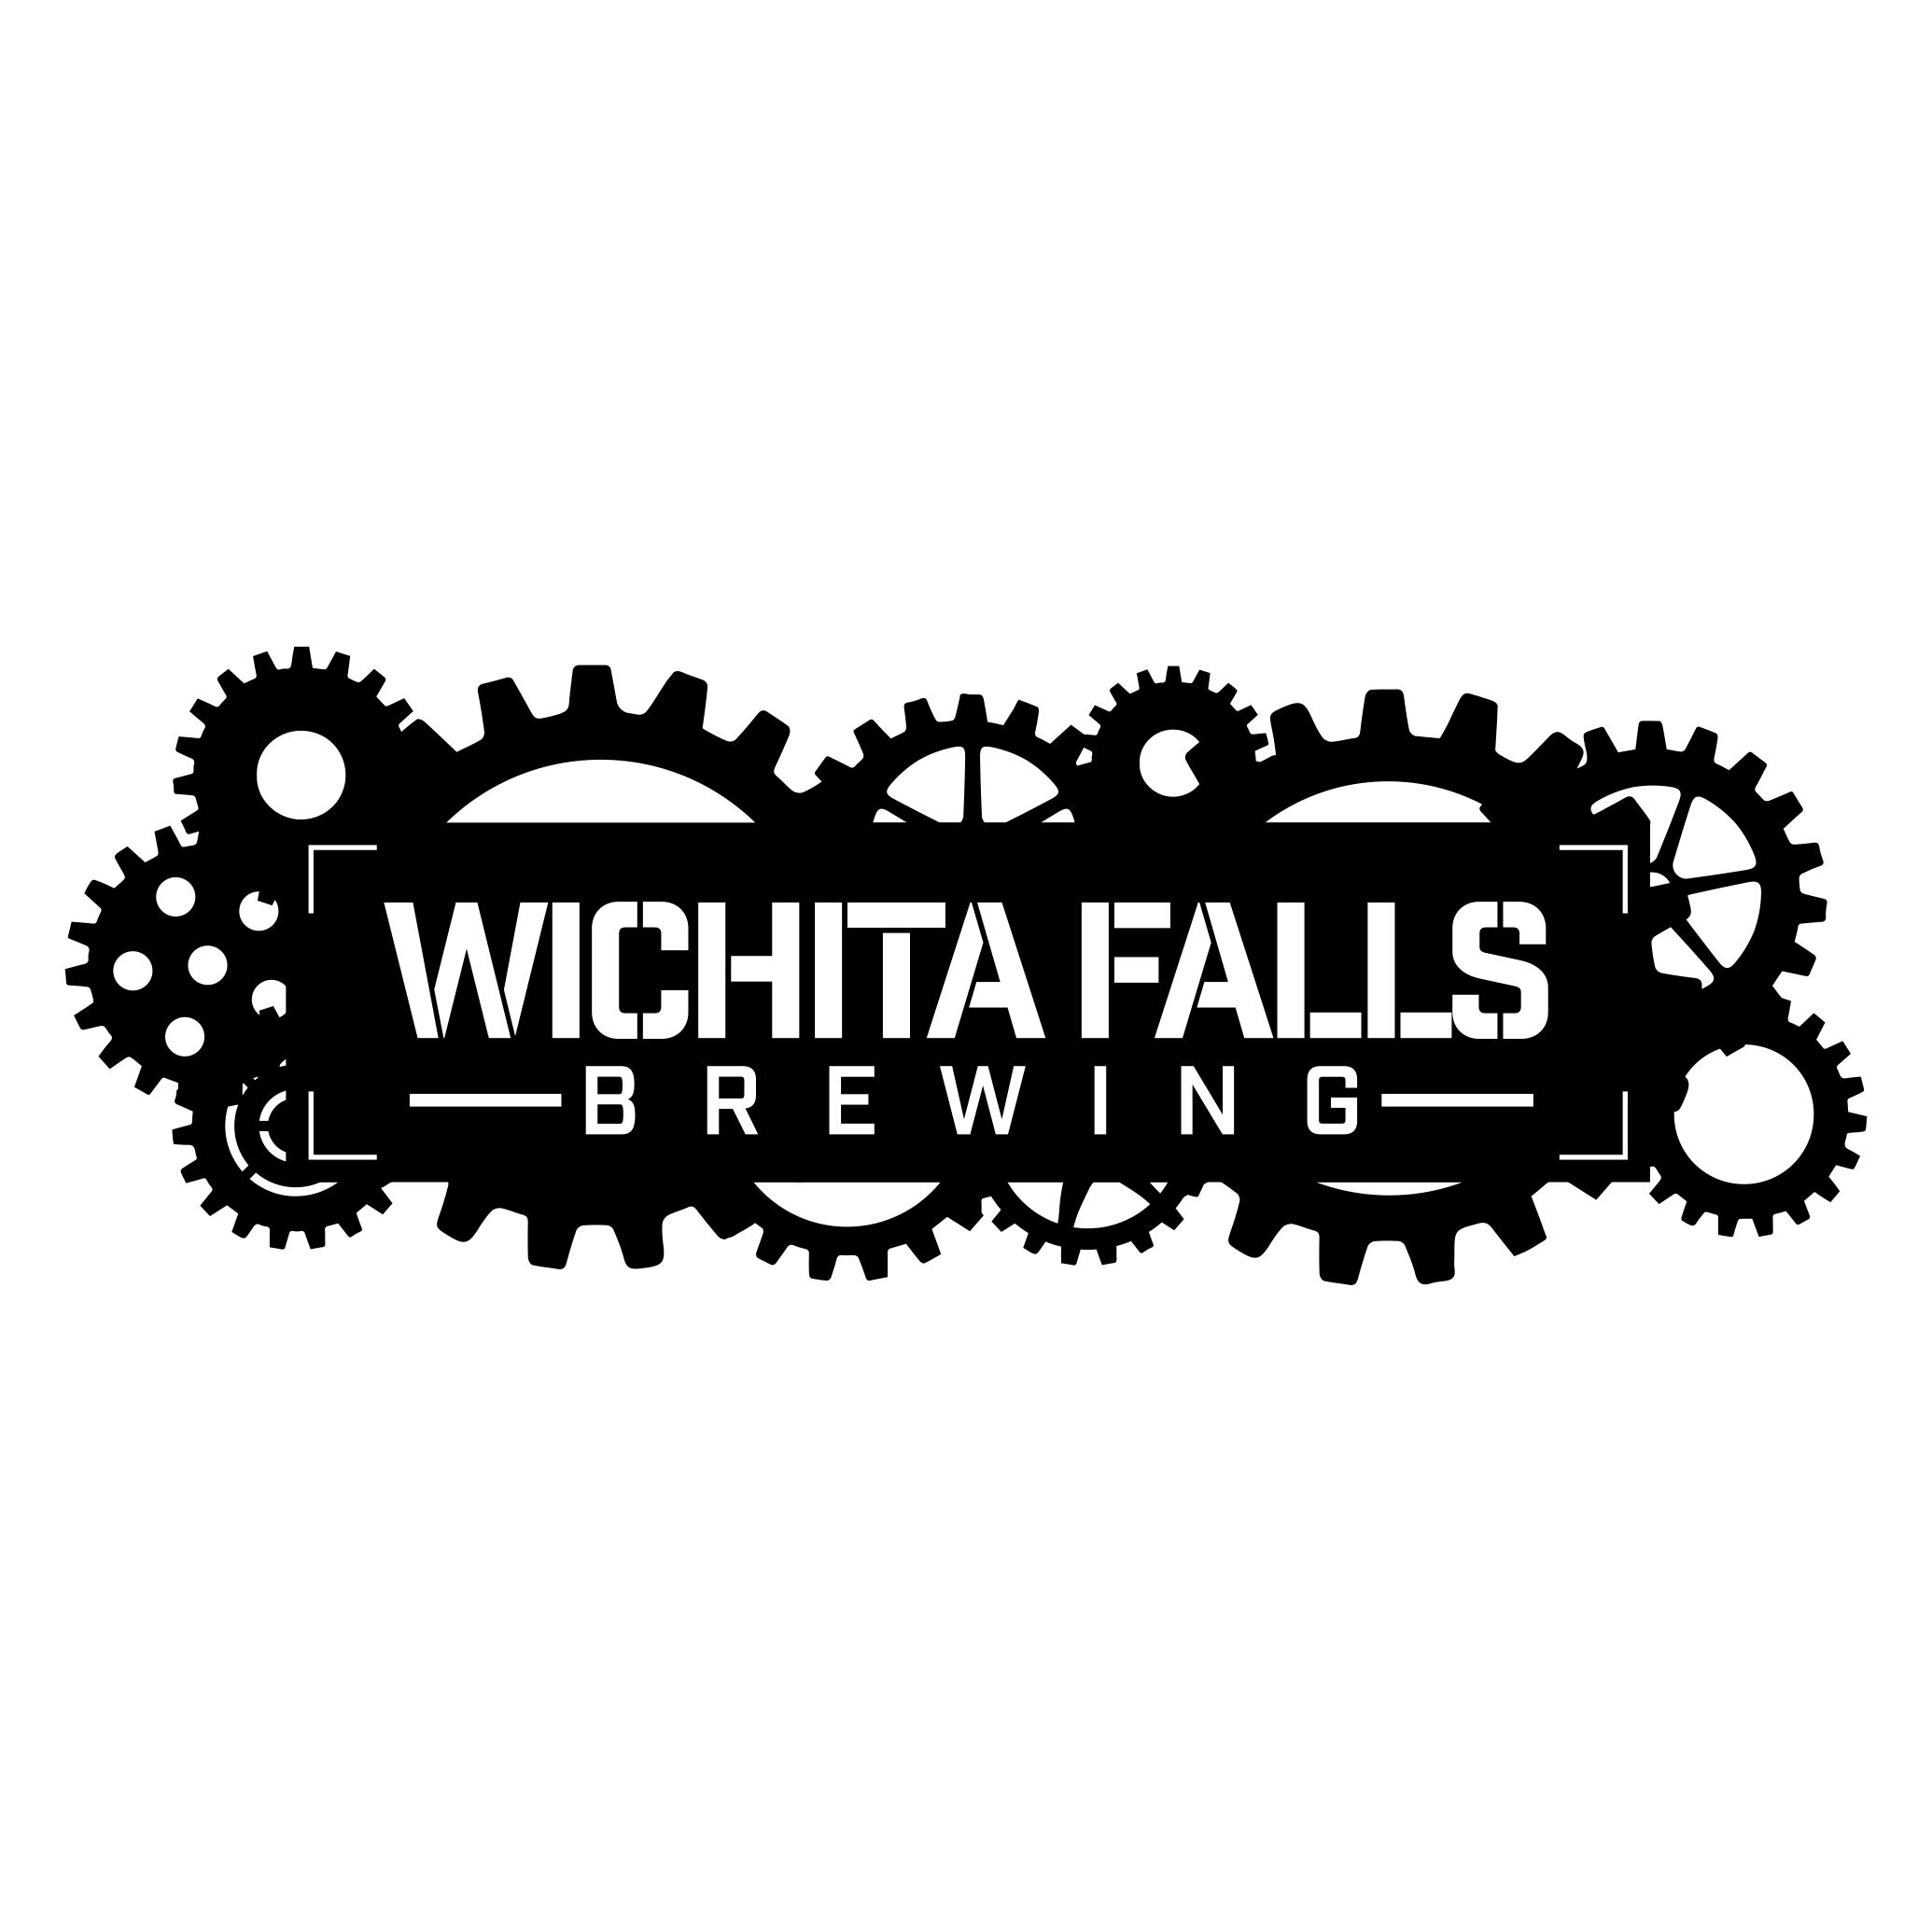 Wichita Falls Brewing Company